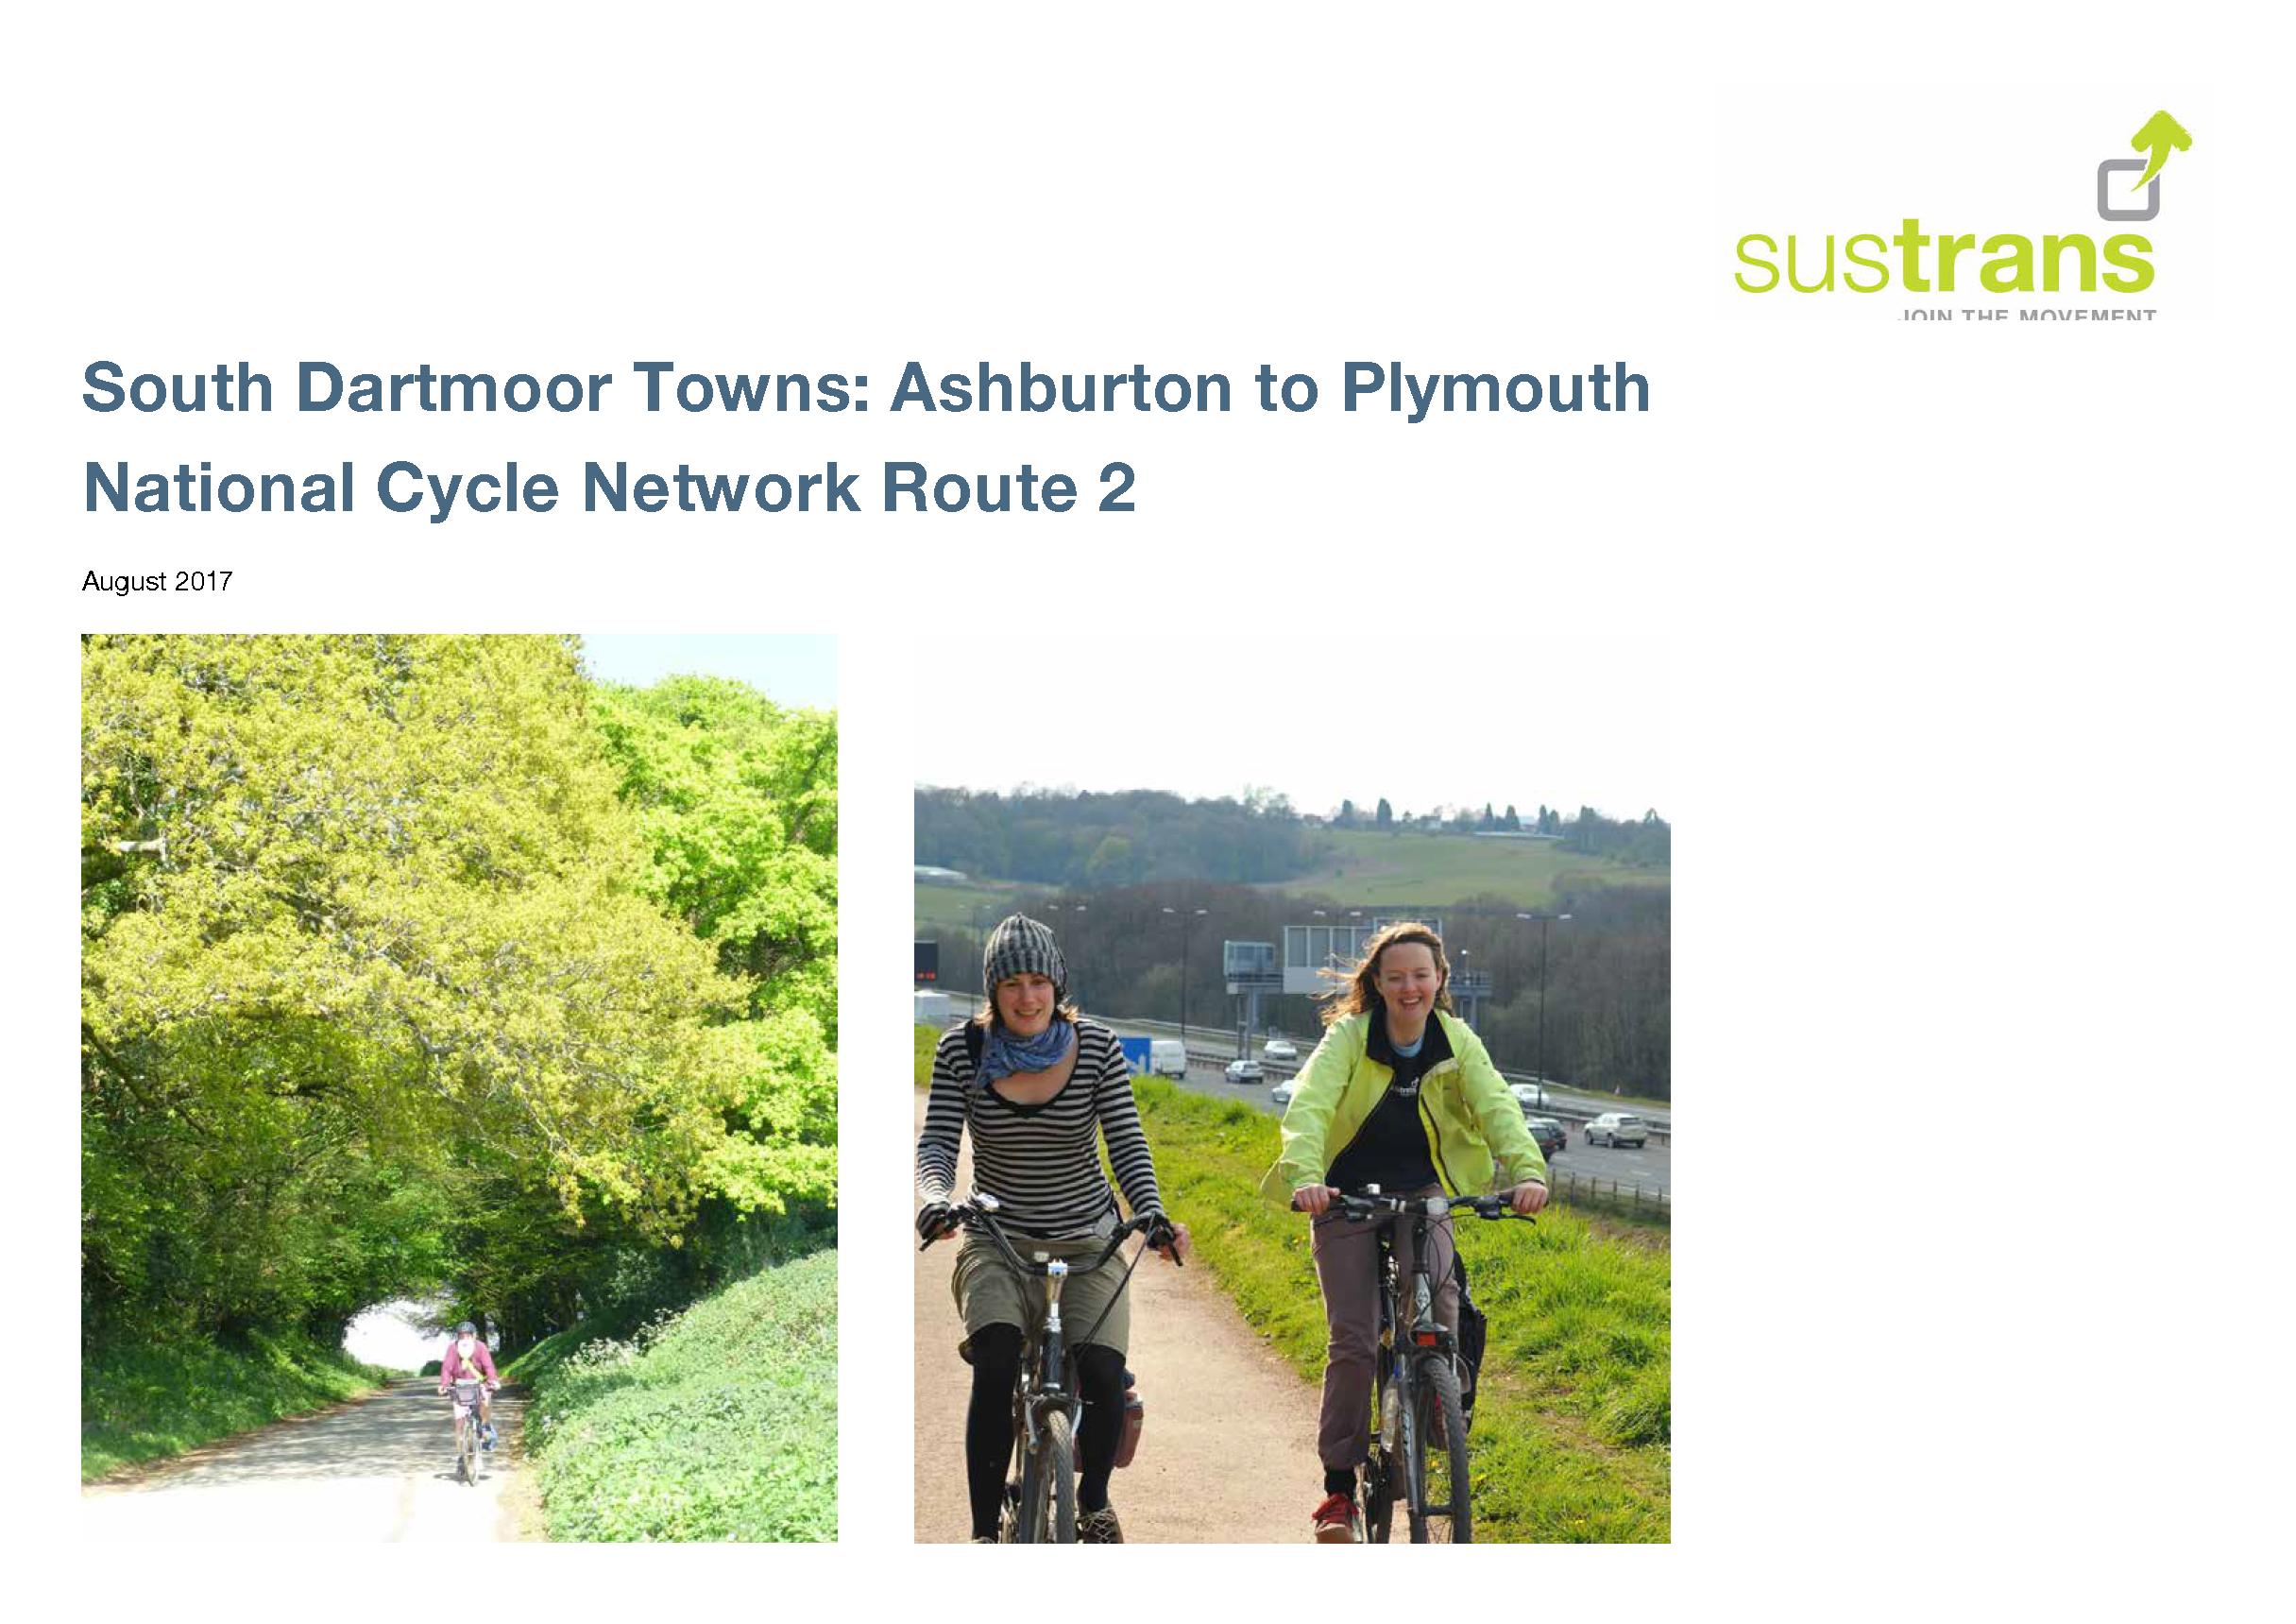 Sustrans_Ashburton to Plymouth_NCN2_Feasibility study_v1-0